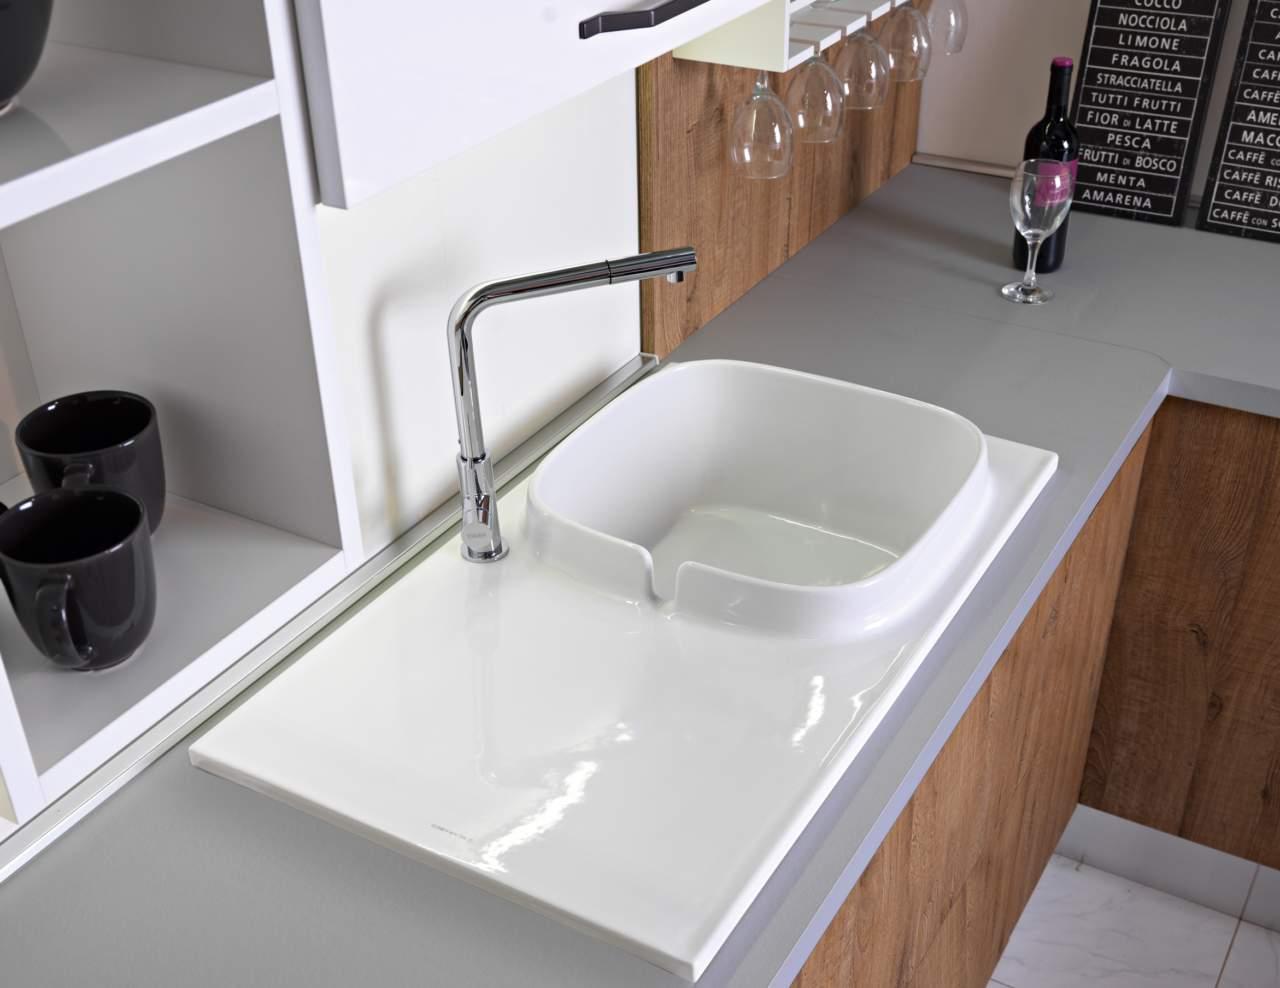 Lavandino Cucina Con Gocciolatoio scarabeo presenta il lavello in ceramica up | ambiente cucina